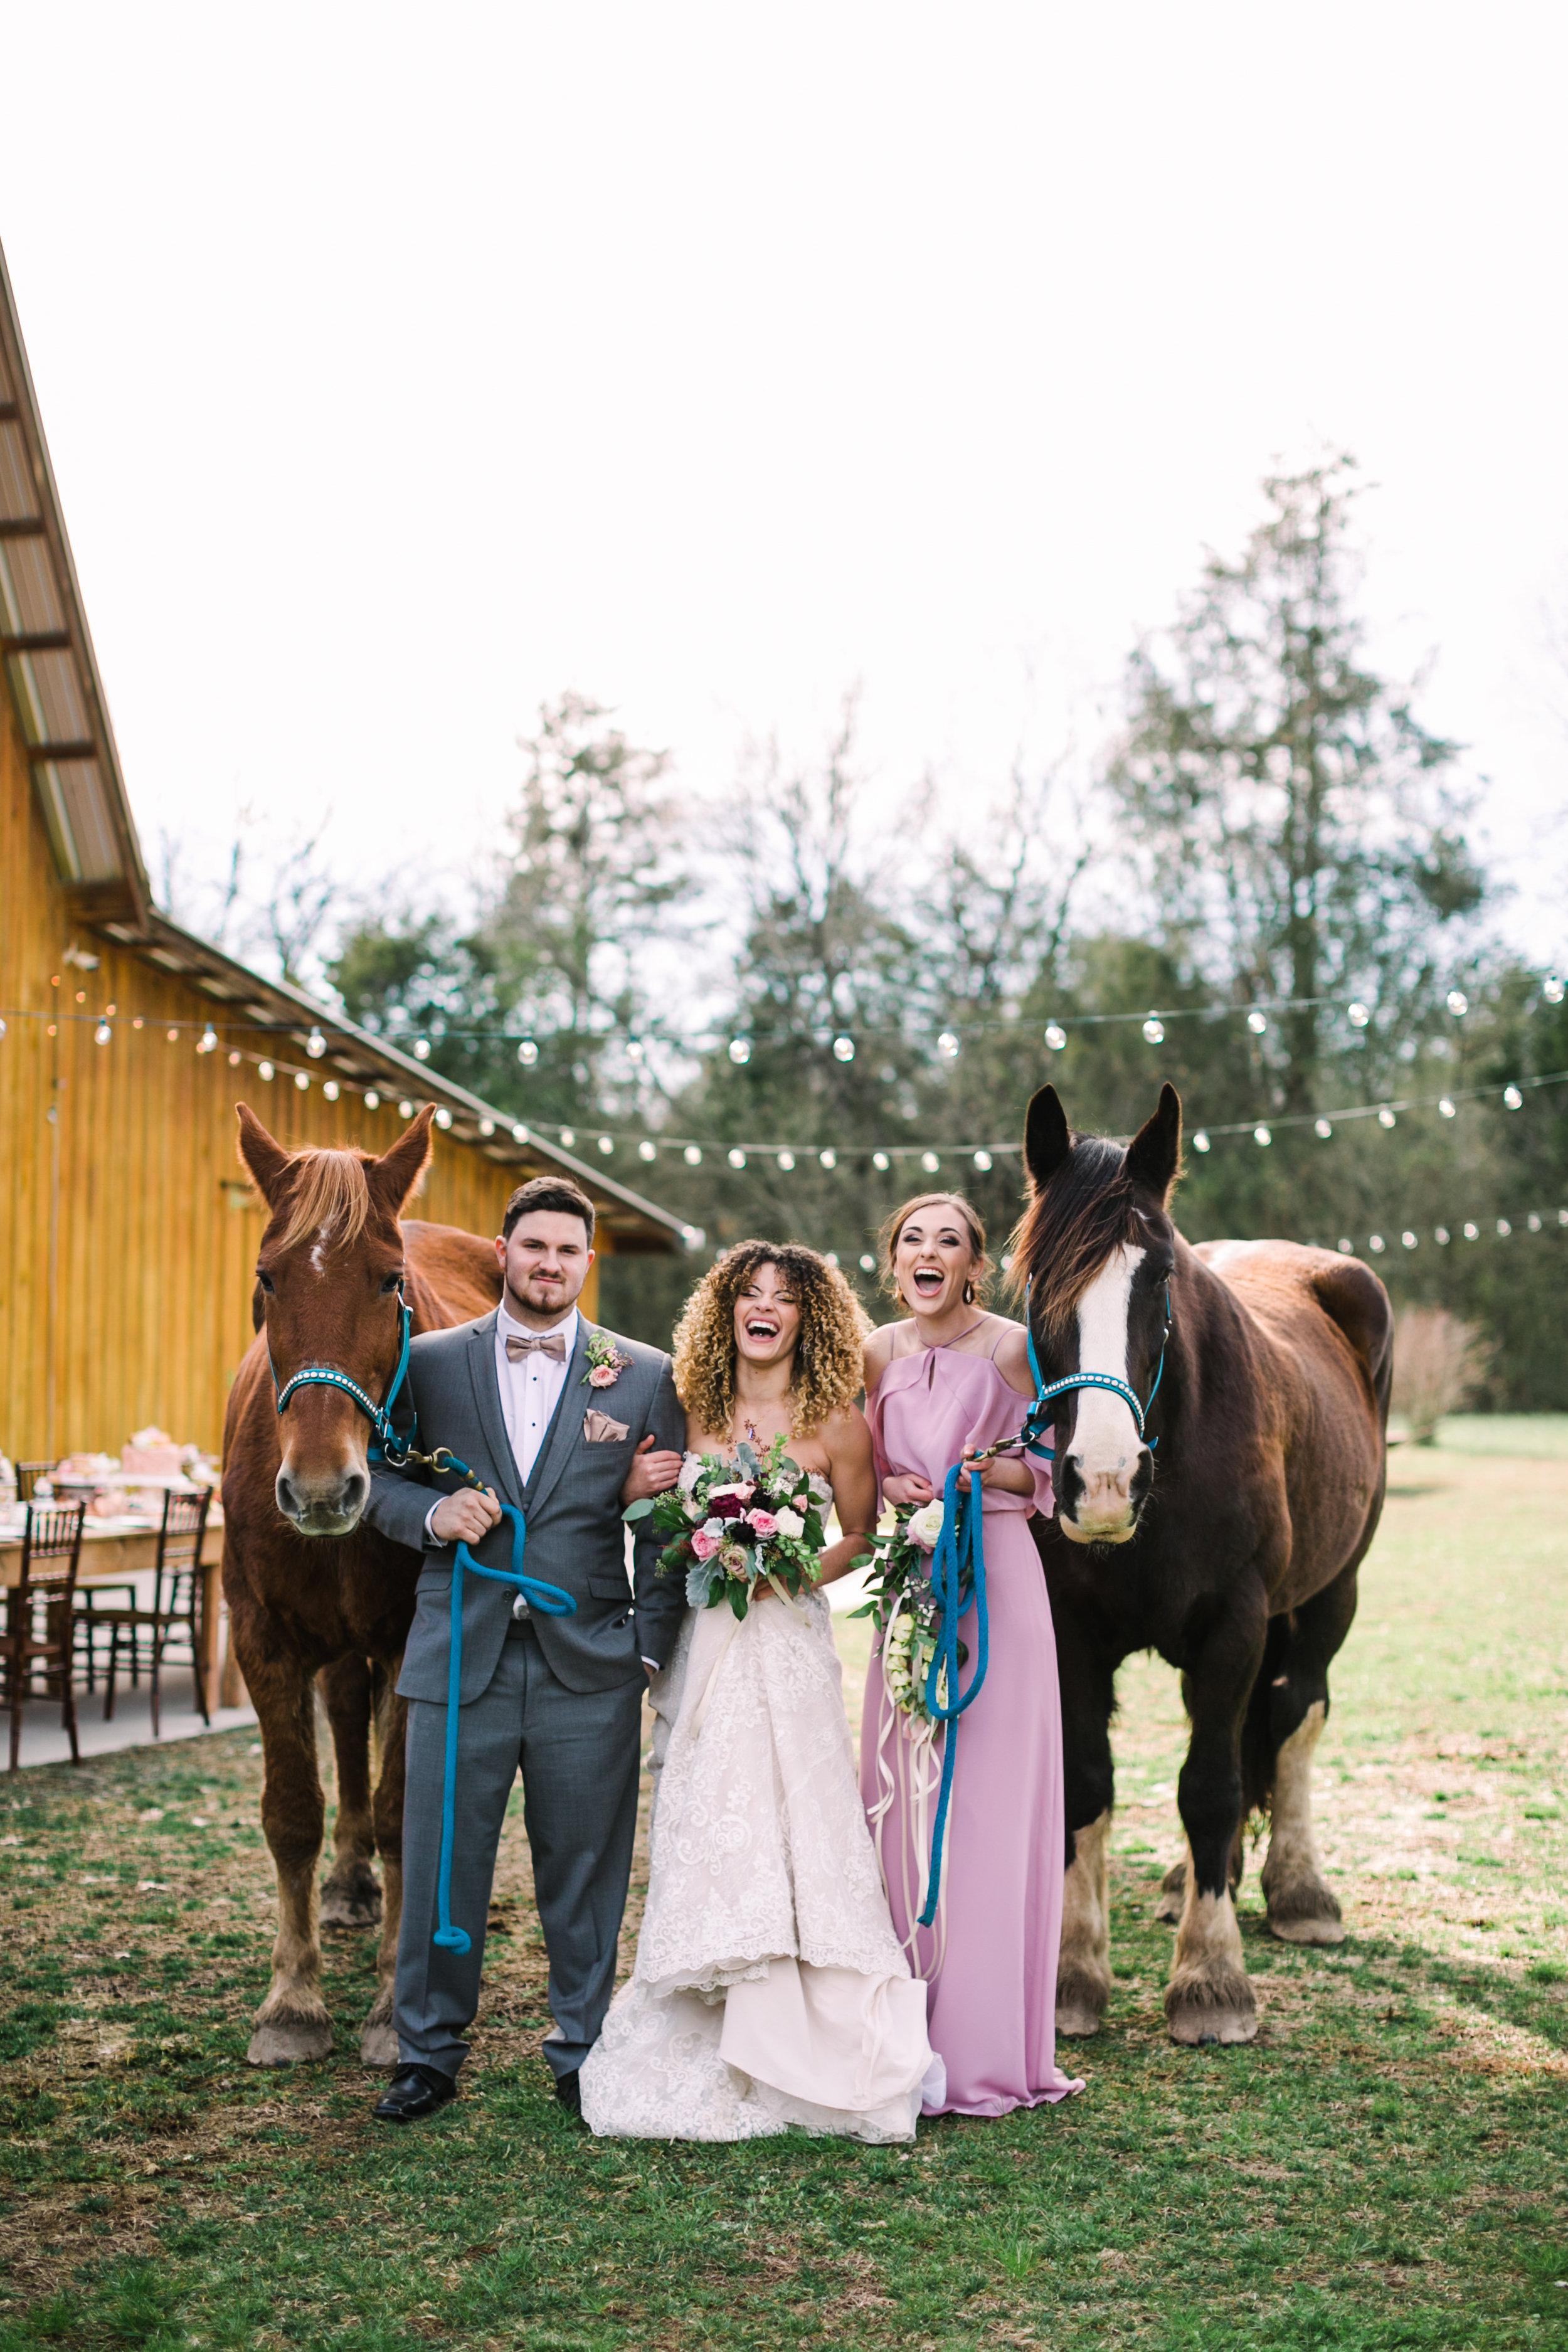 romantic+valentines+day+wedding+horses+chapel (10 of 11).jpg